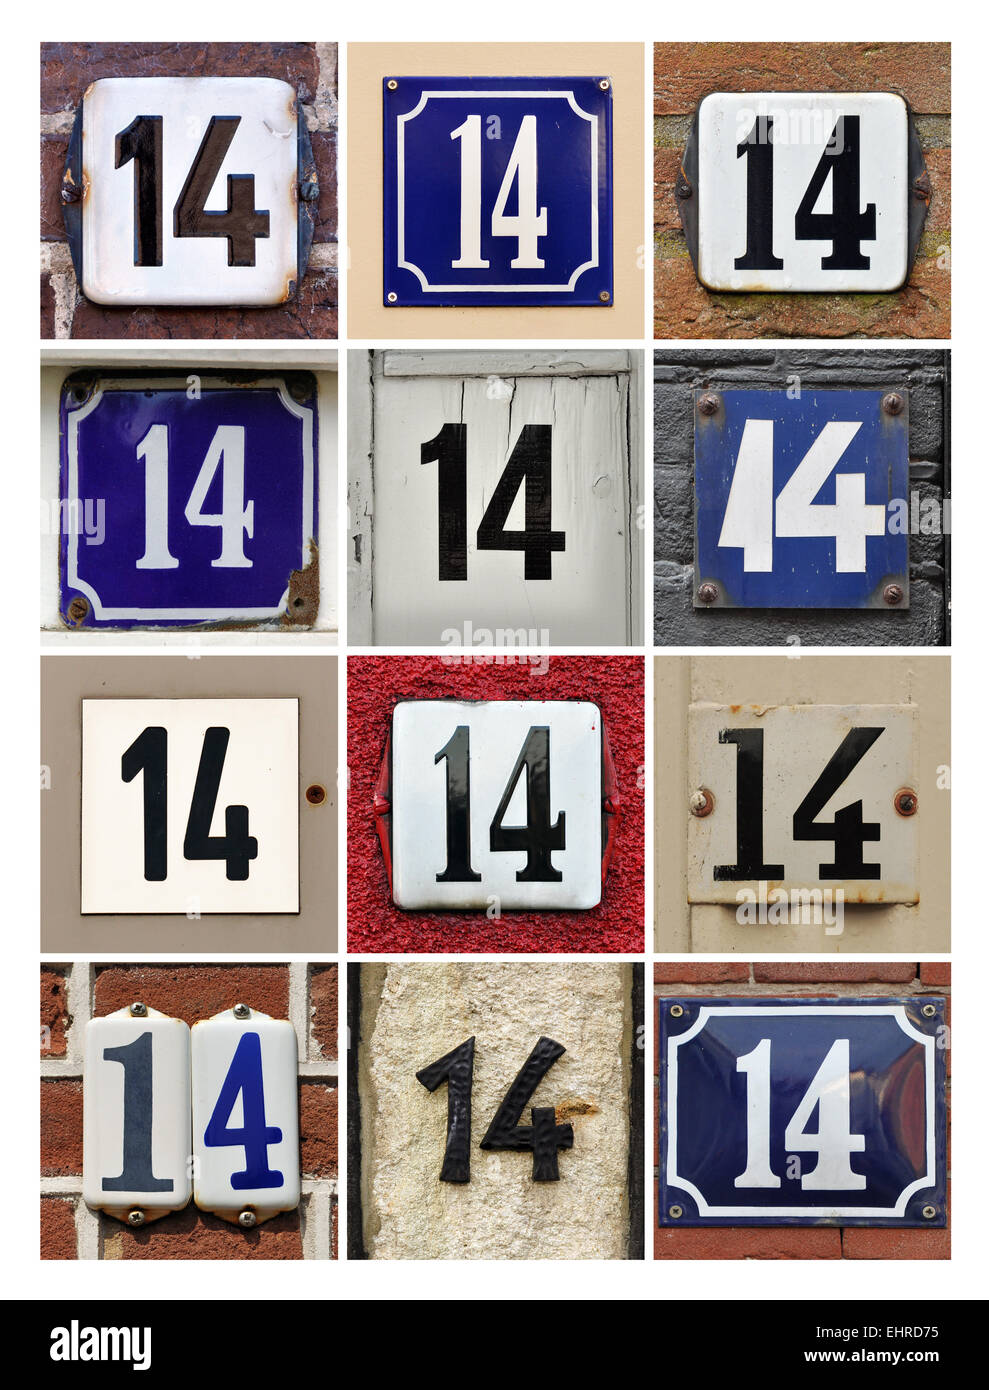 Número 14 - Collage de catorce Números de casa Imagen De Stock